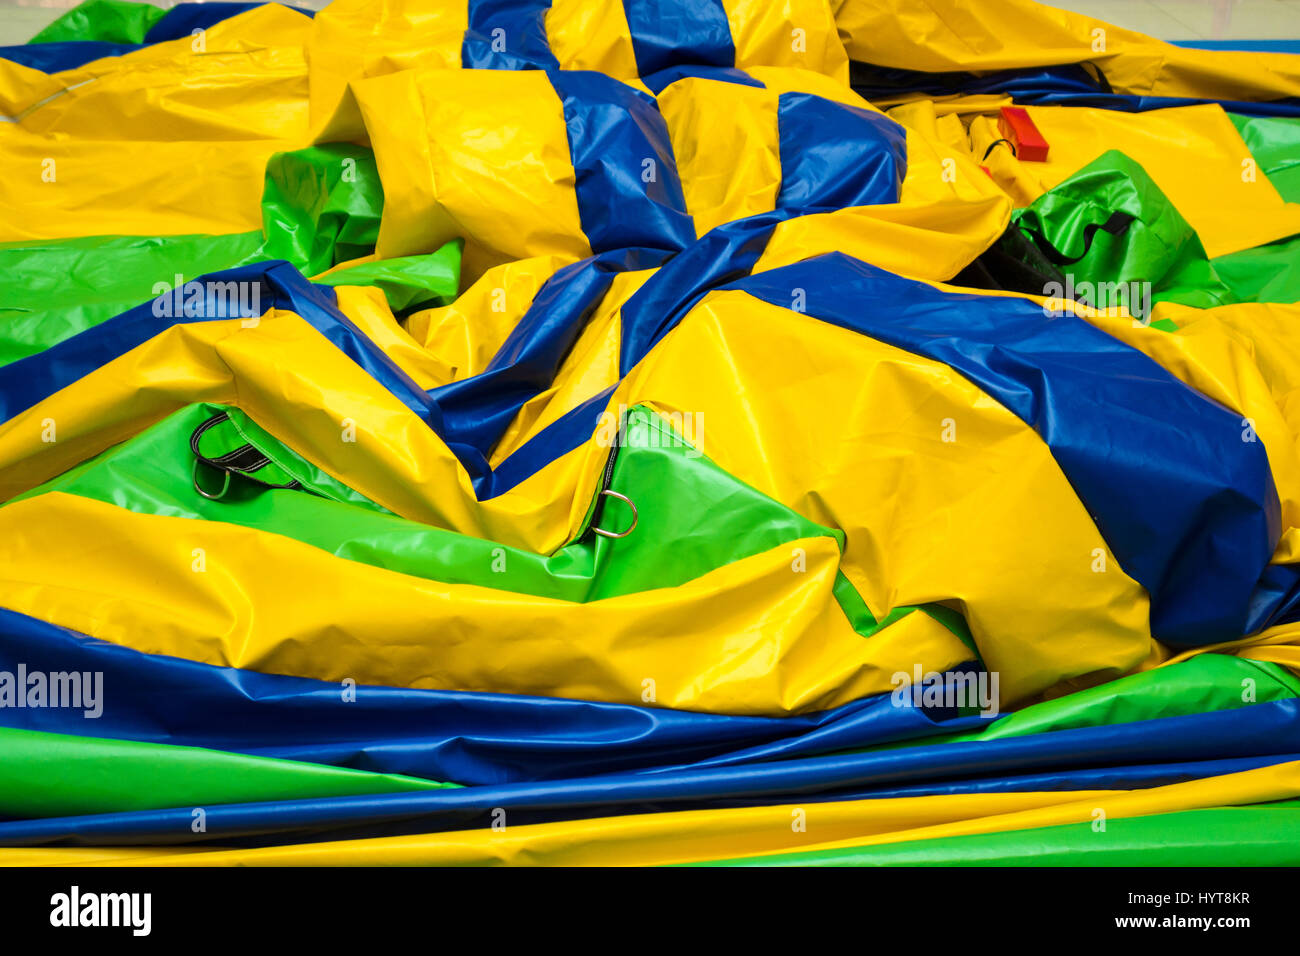 Deflationierten gelb blau grün Hüpfburg auf dem Stock Stockbild